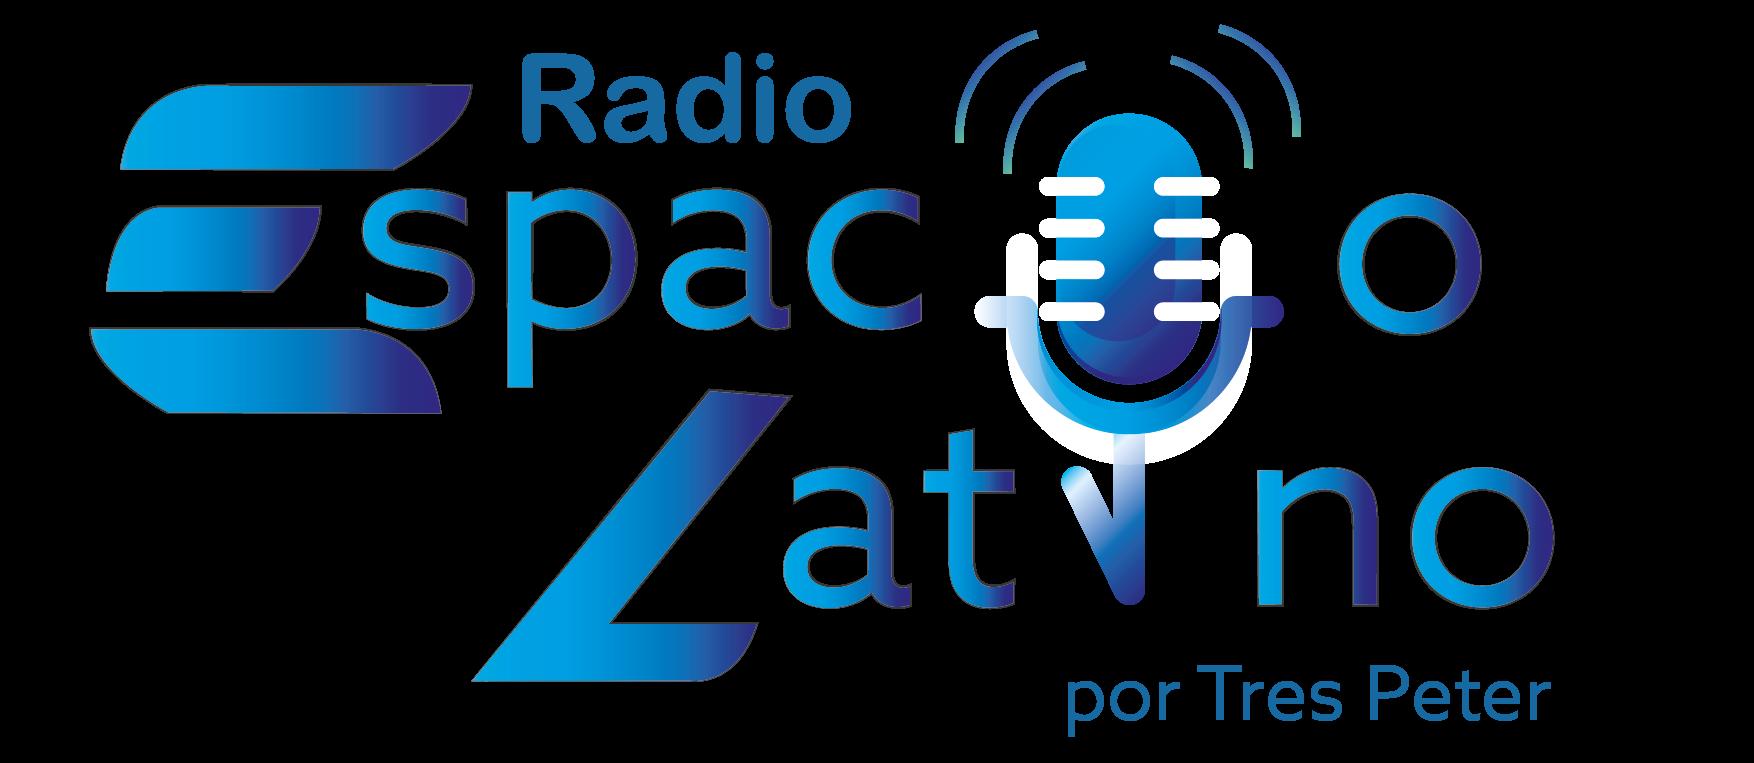 Radio Espacio Latino